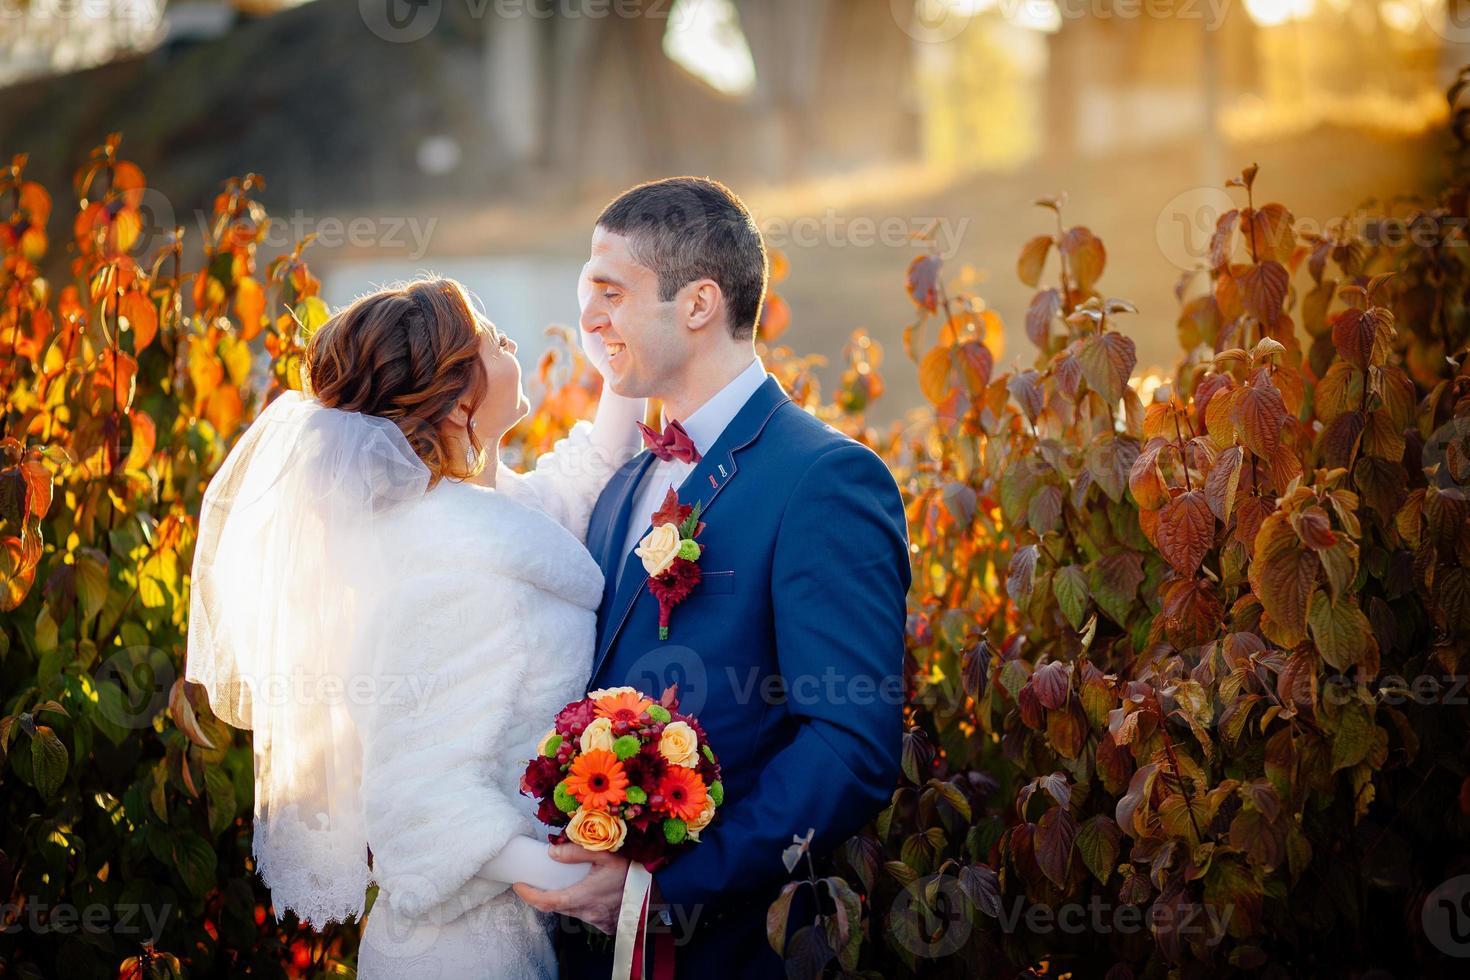 bruidegom en bruid herfst bruiloft foto